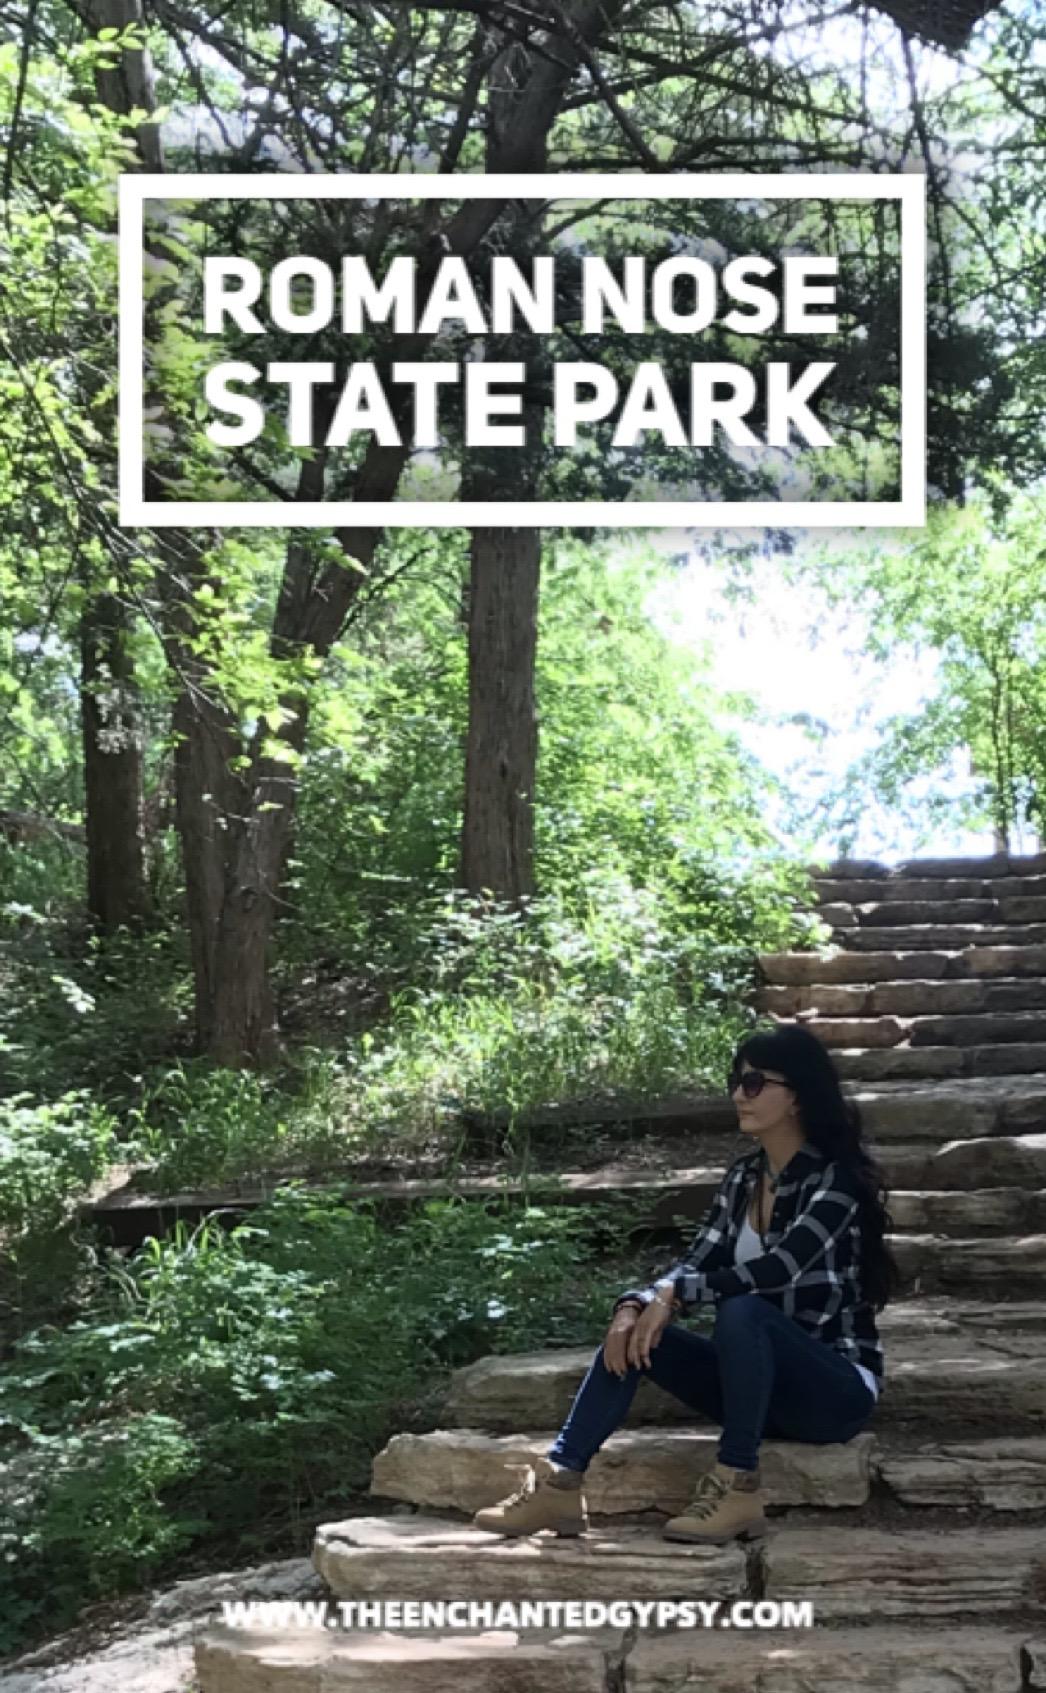 Roman Nose State Park